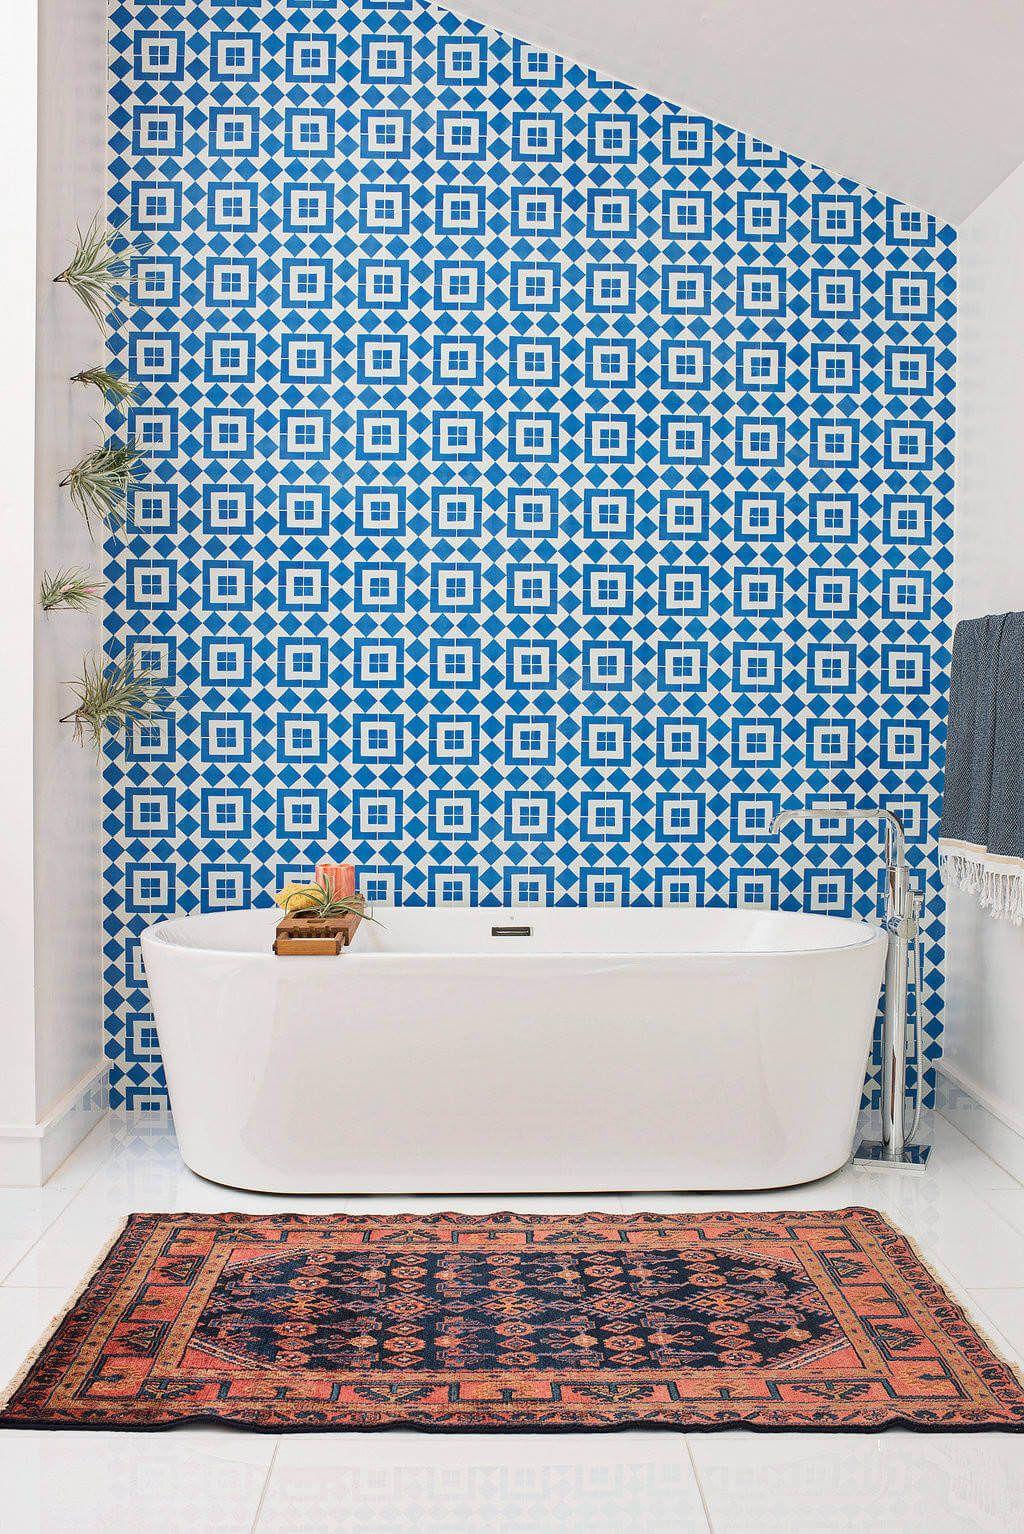 Casual Hip Home by Regan Baker Design | tiles mosaics vinyl etc ...